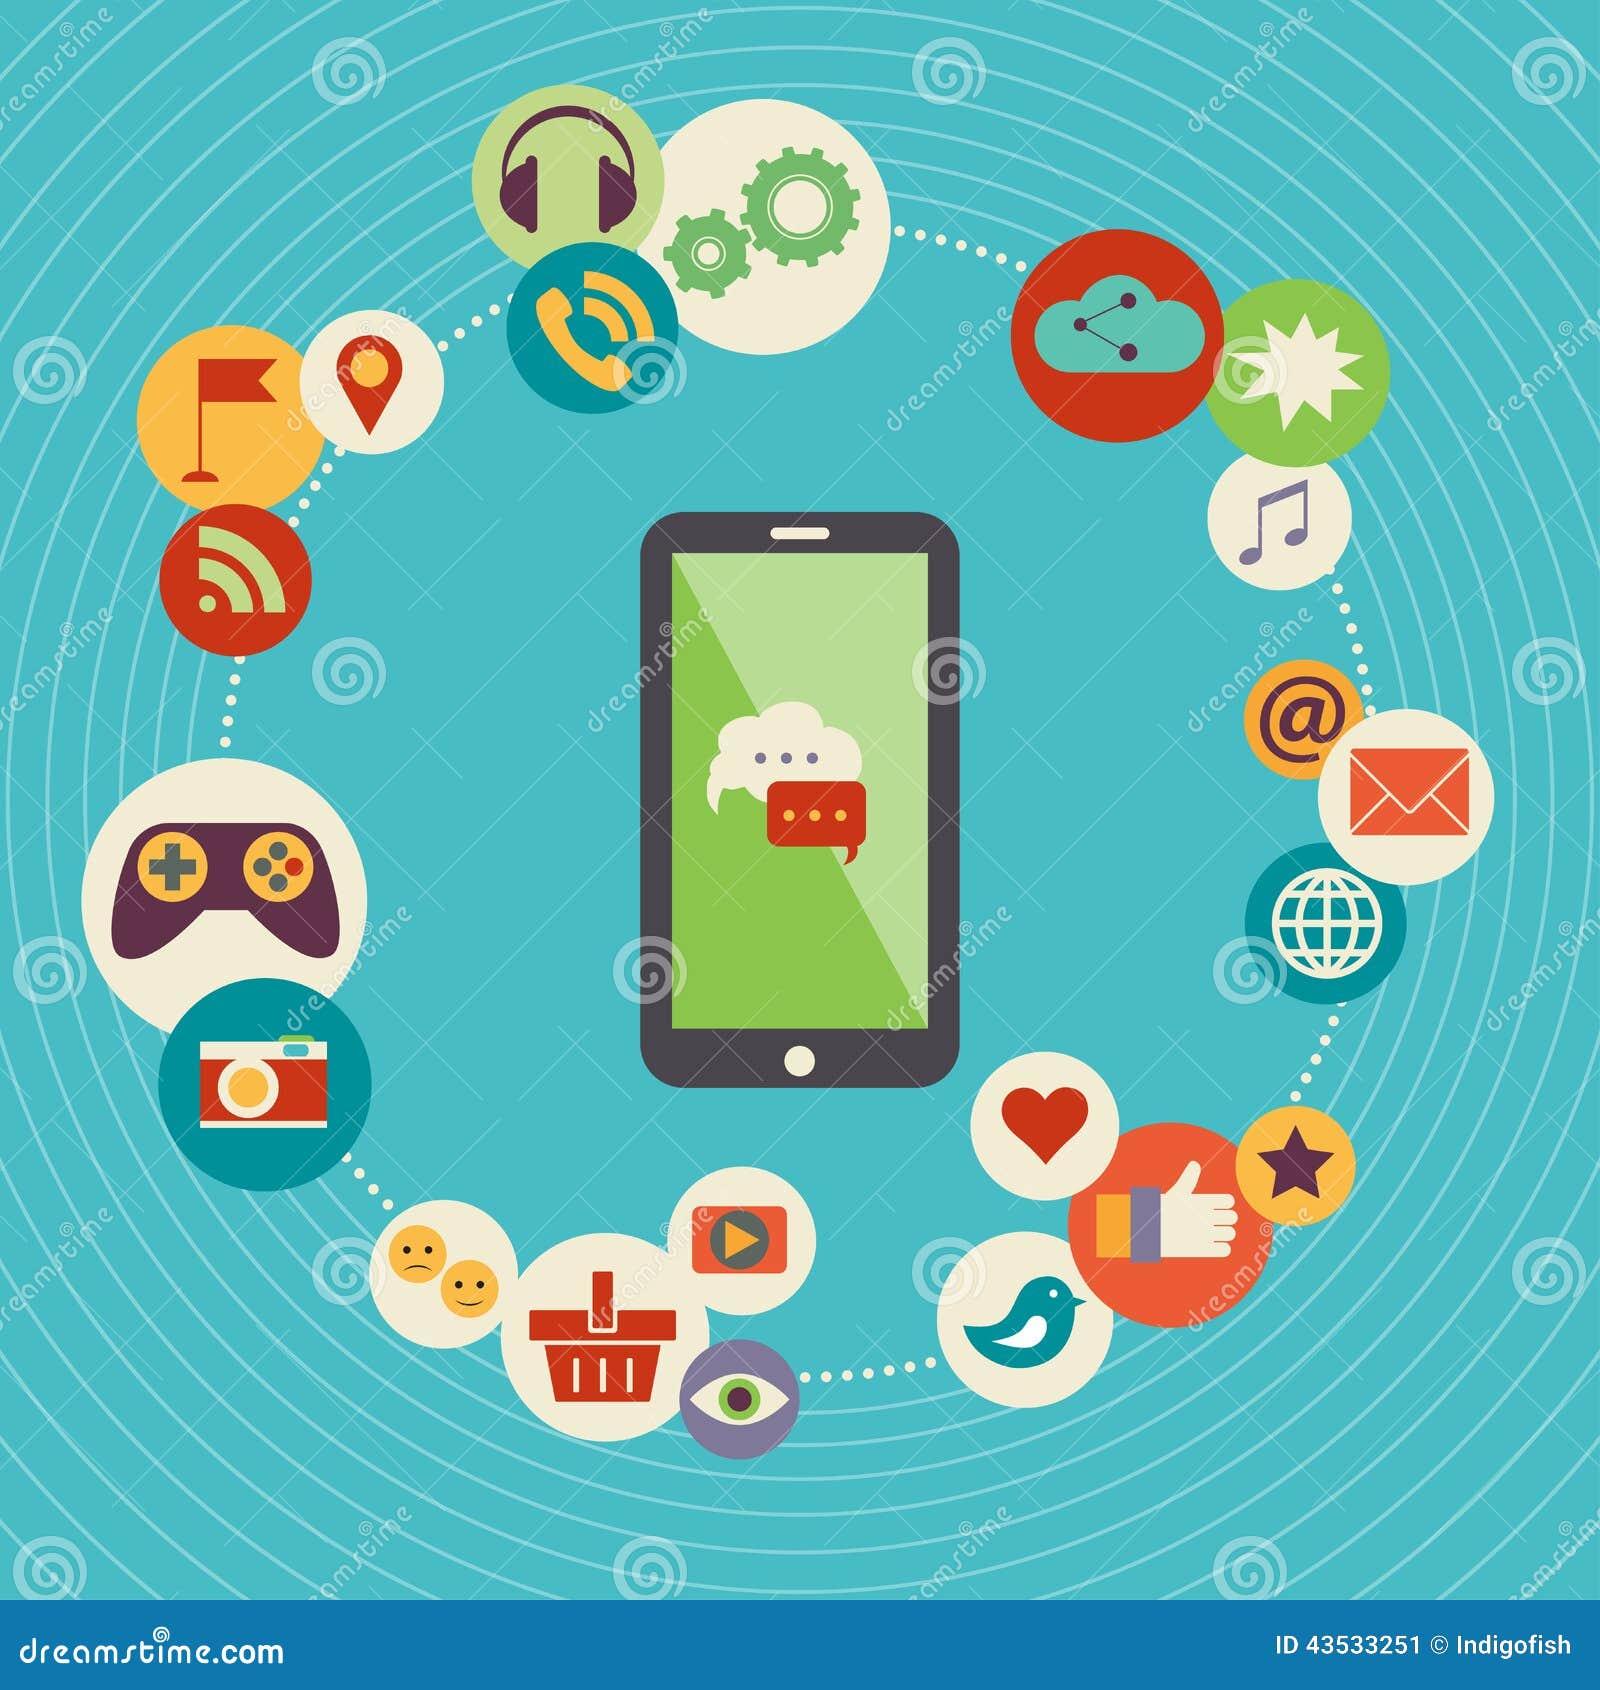 Flat Design Modern Vector Illustration Concept Of Social Media Stock ...